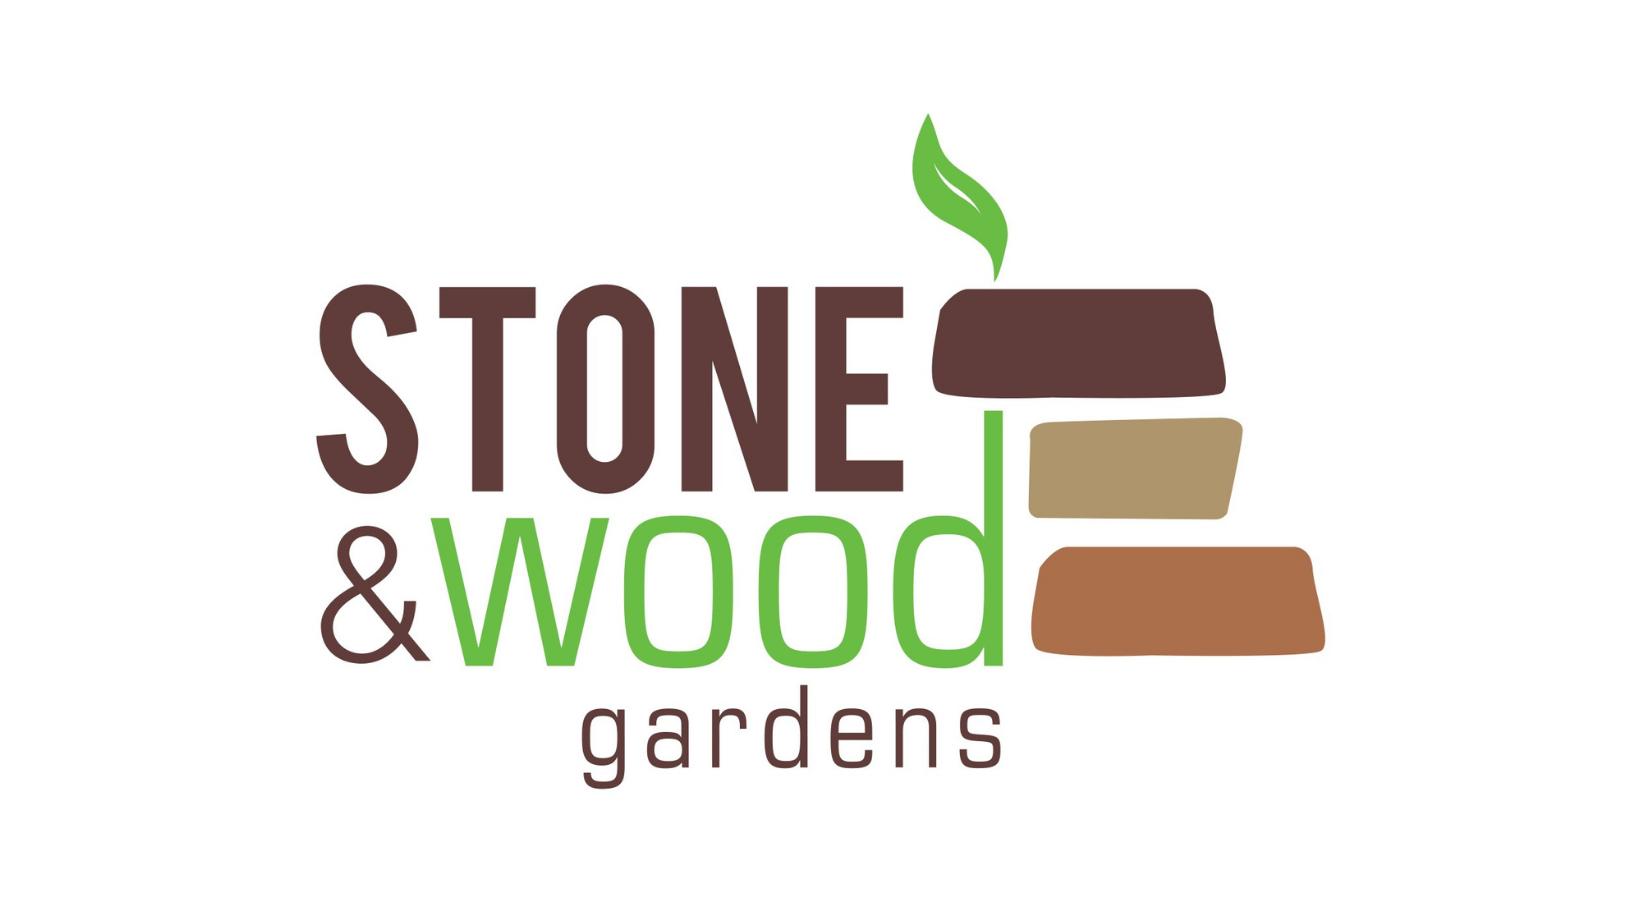 Stone & Wood Gardens